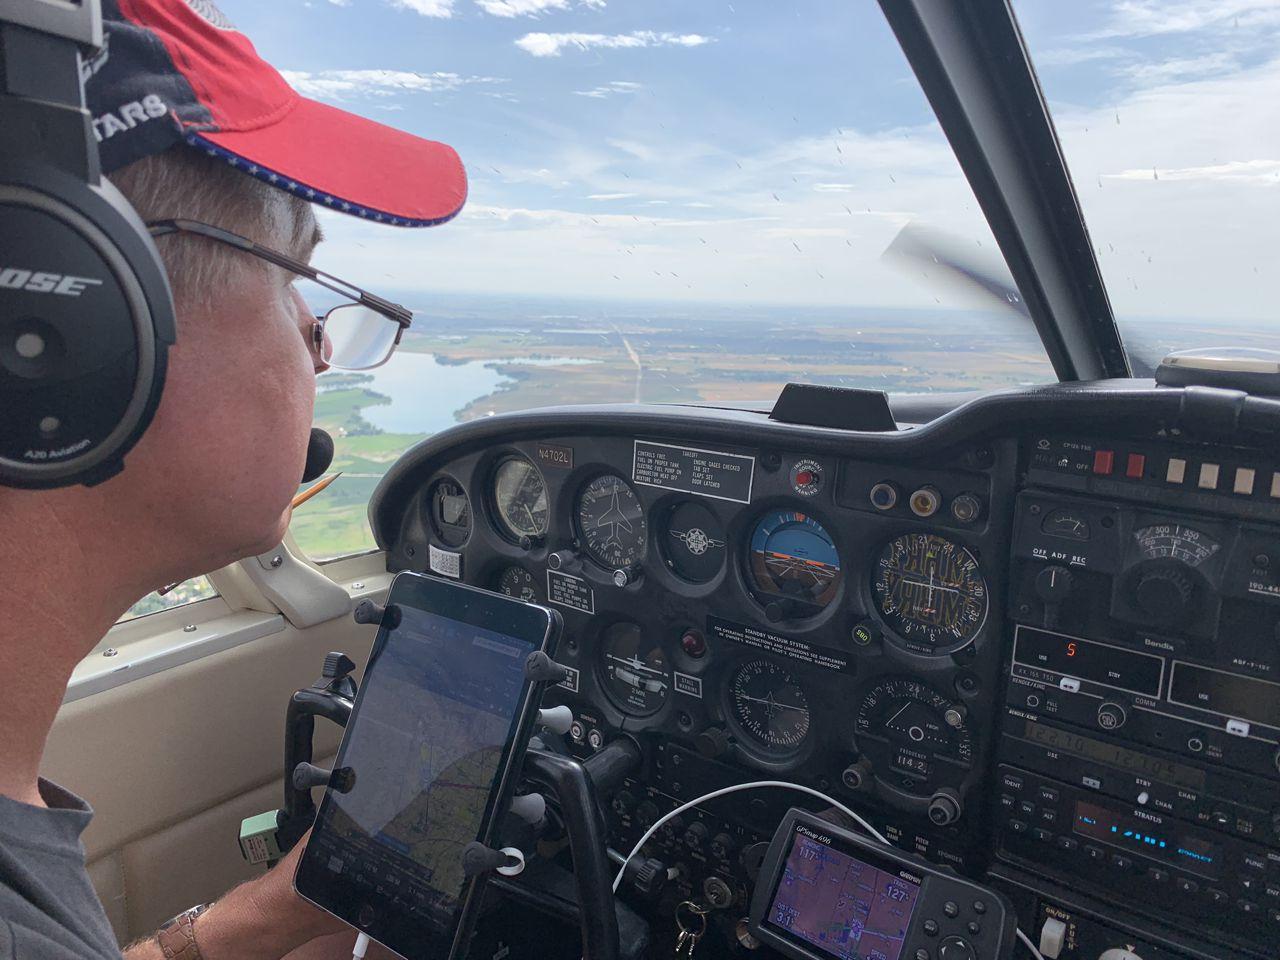 Arnie Flying recreational aerobatics